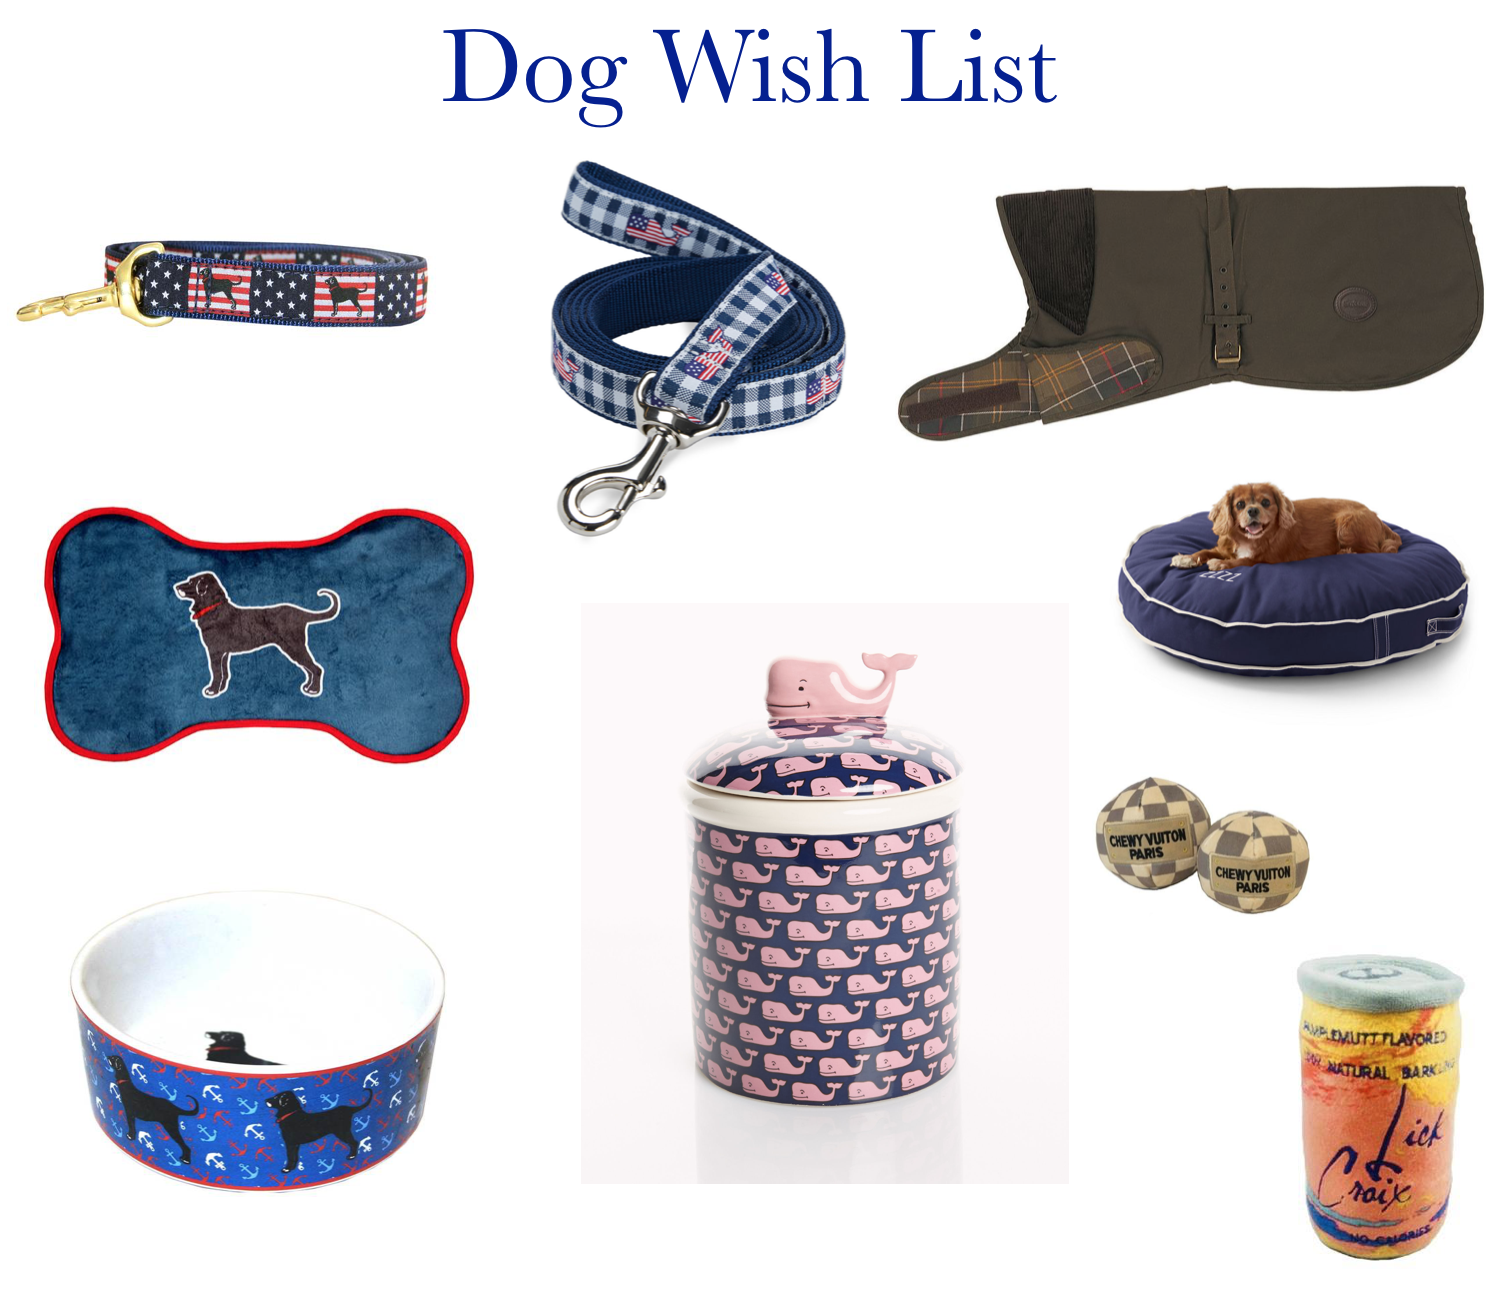 Melanie May: Dog Items Wish List